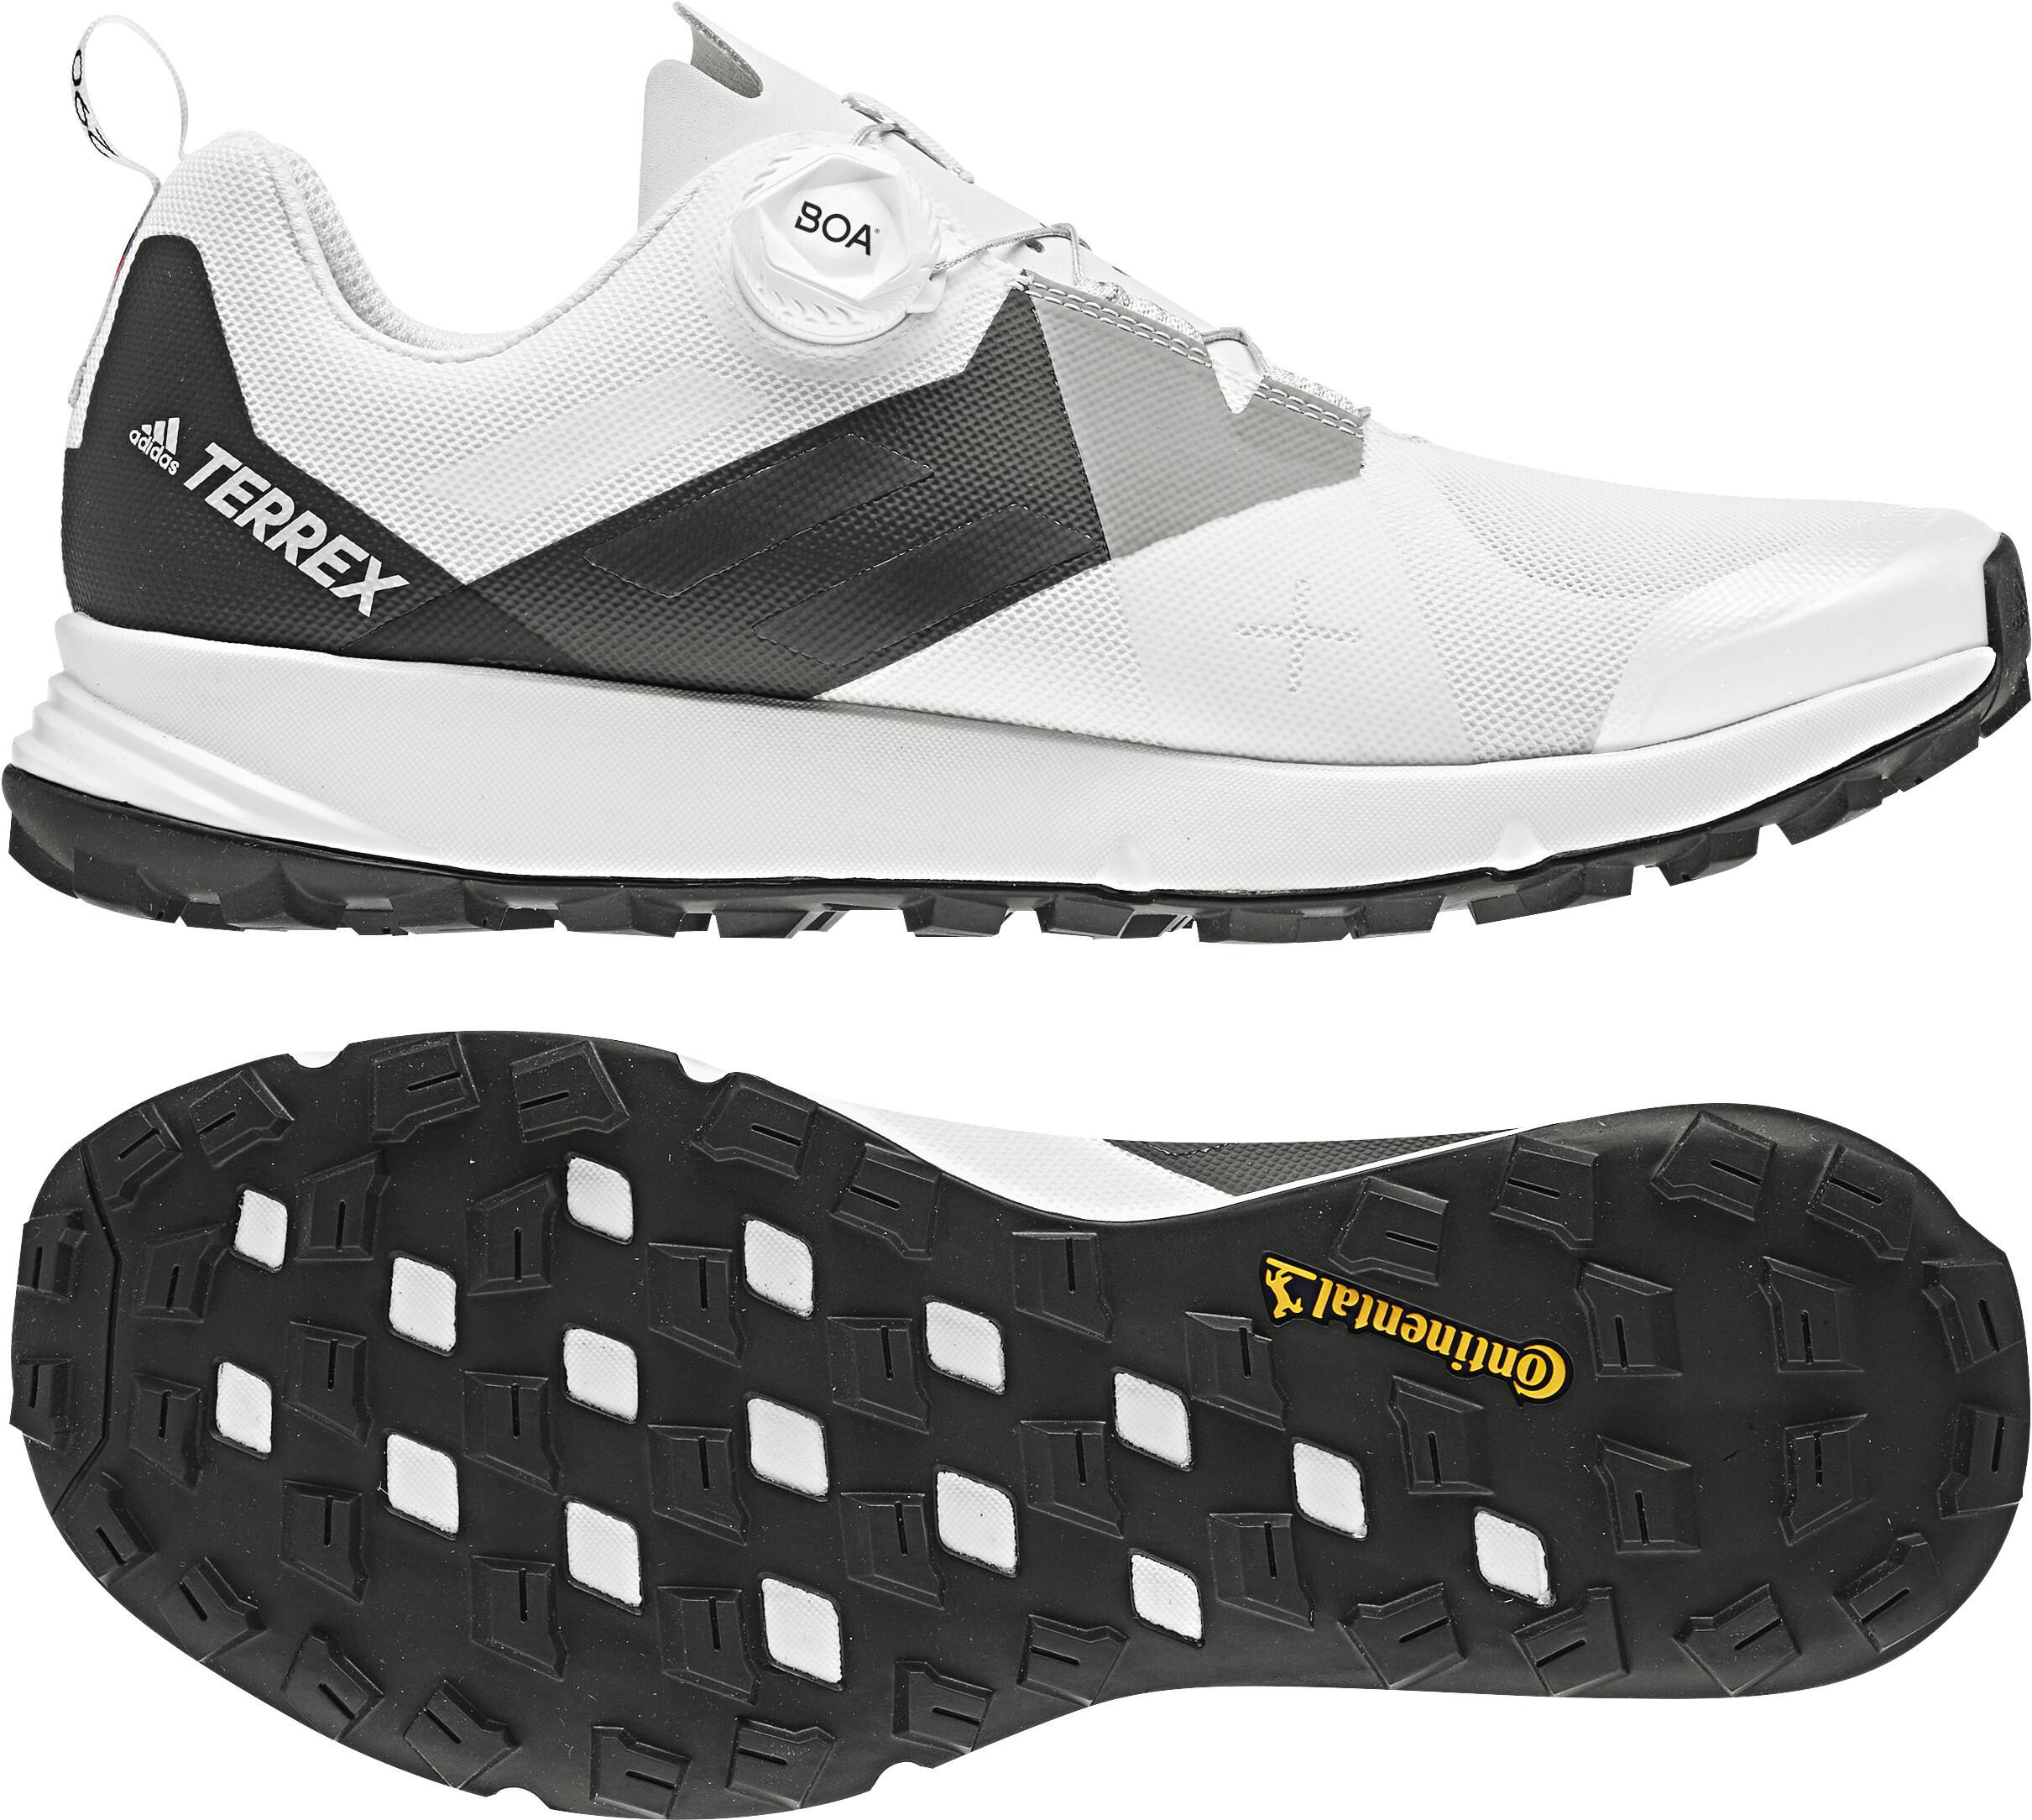 sports shoes 5b993 b11cc adidas TERREX Two Boa scarpe da corsa Uomo bianconero